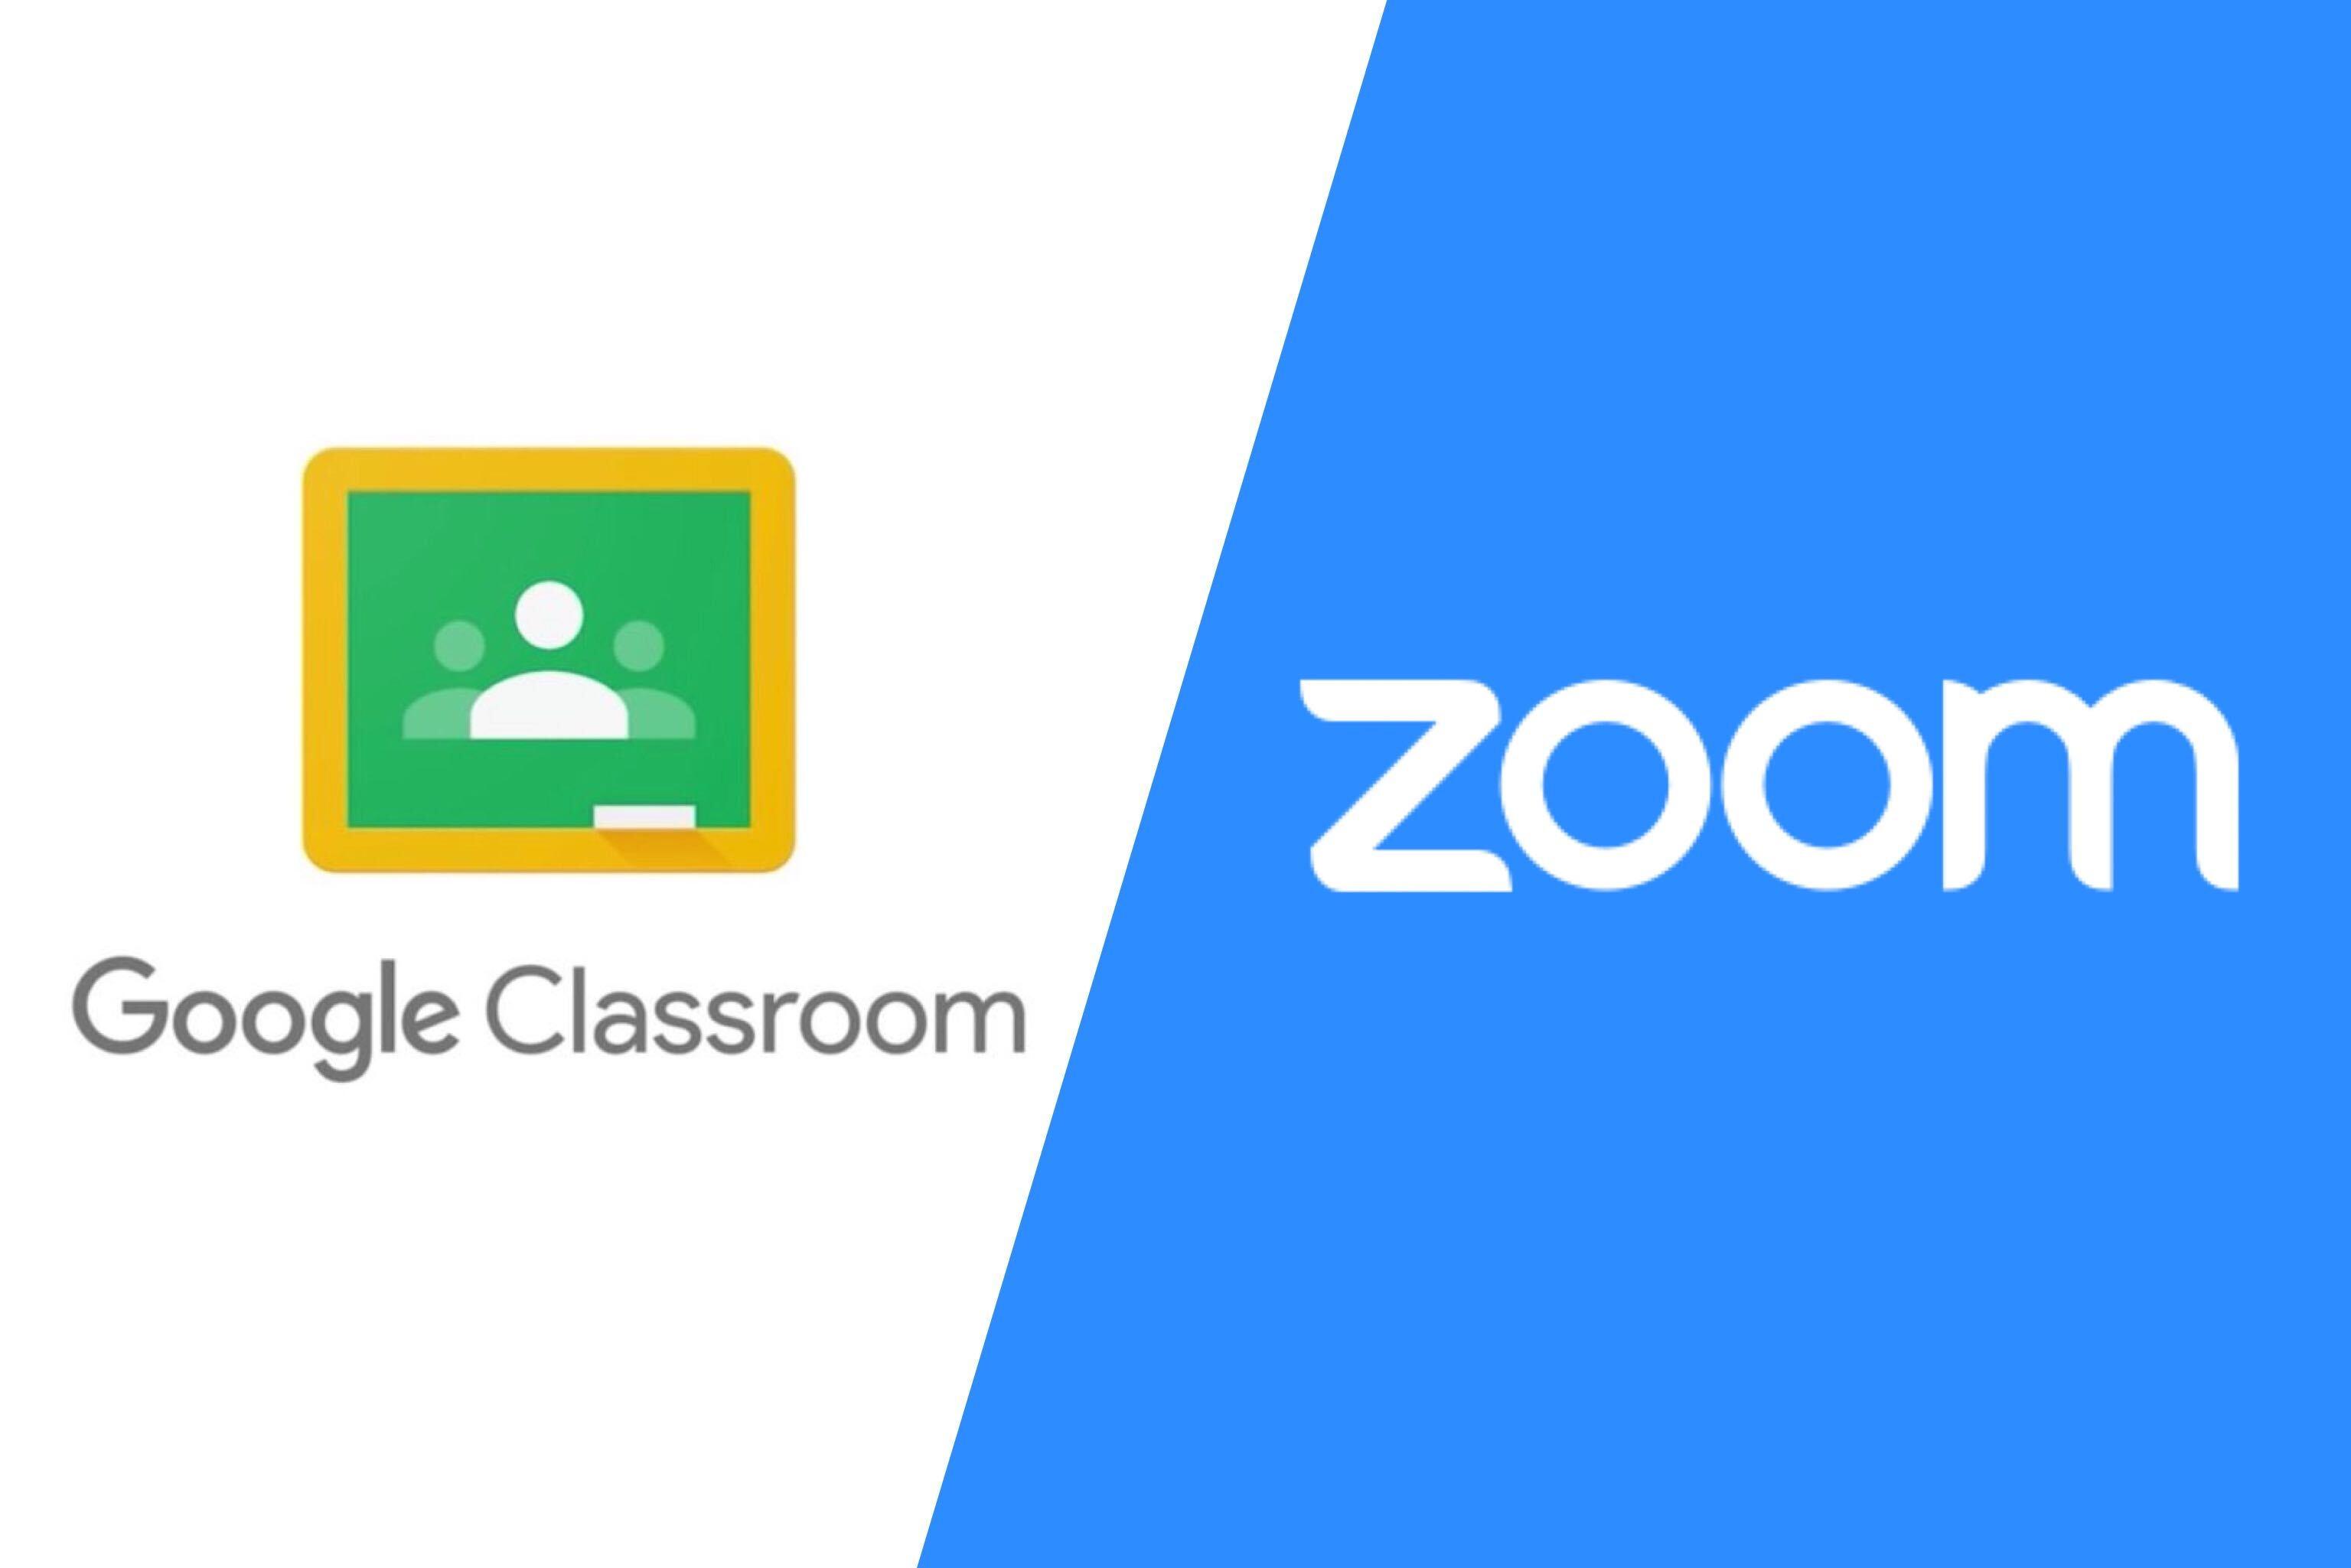 zoom vs google classroom?